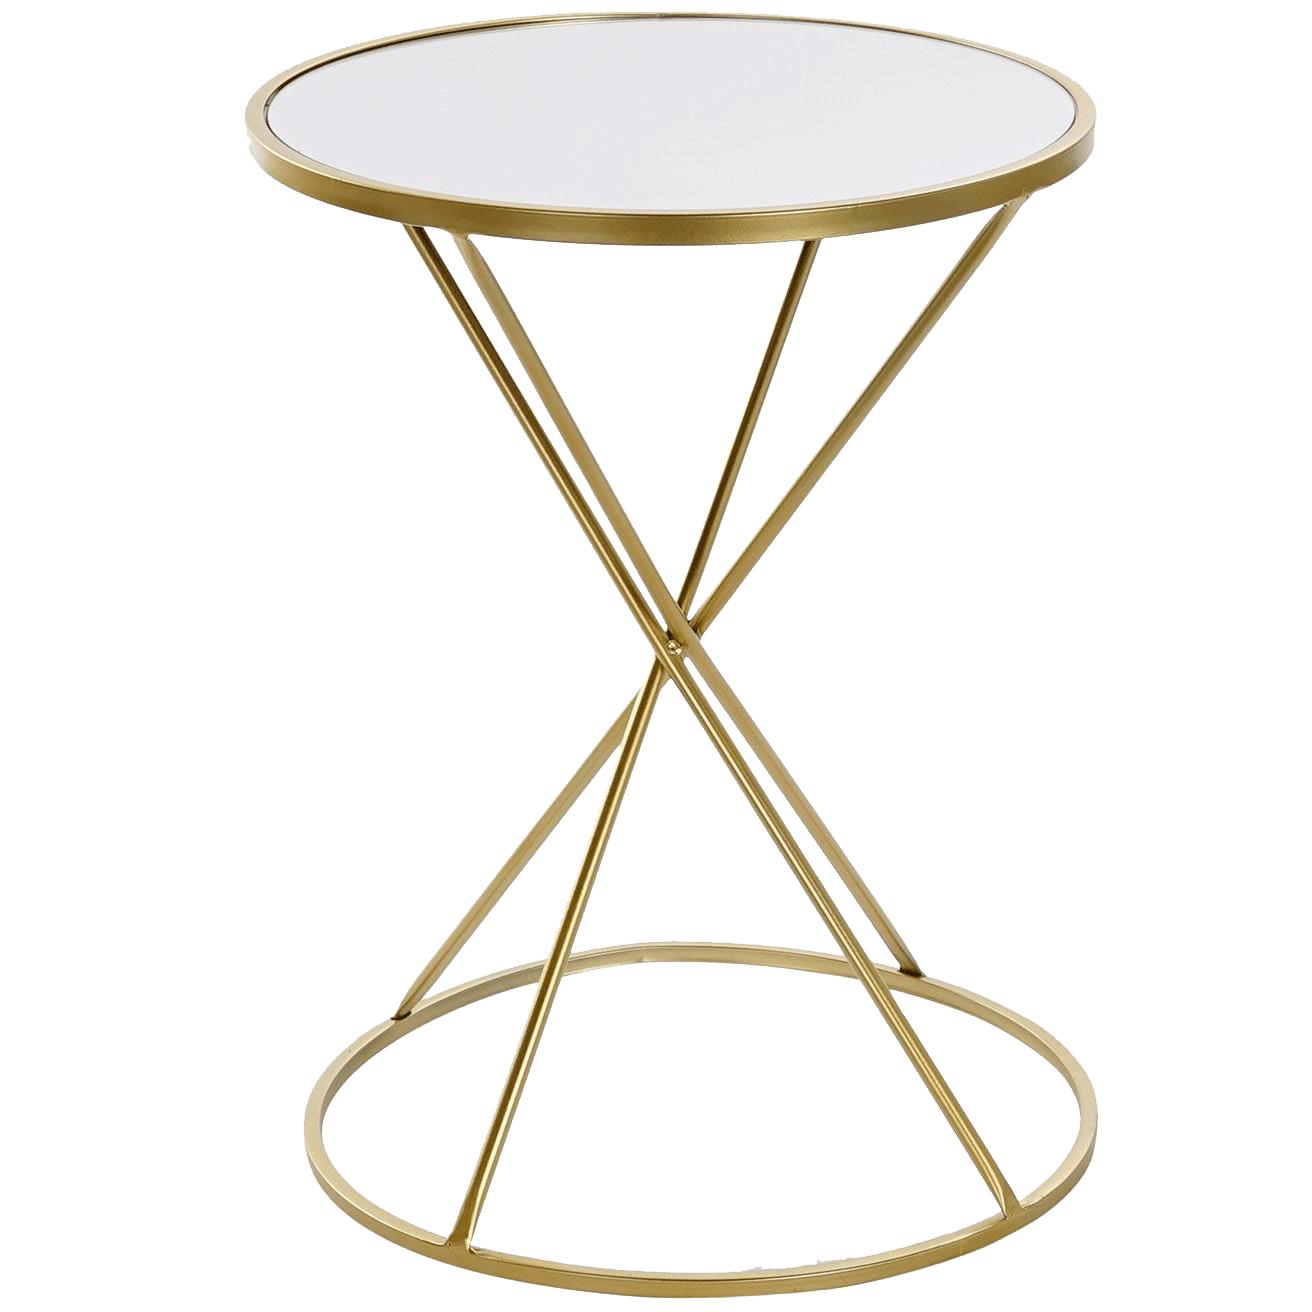 31683-mesita-auxiliar-oro-cristal.png